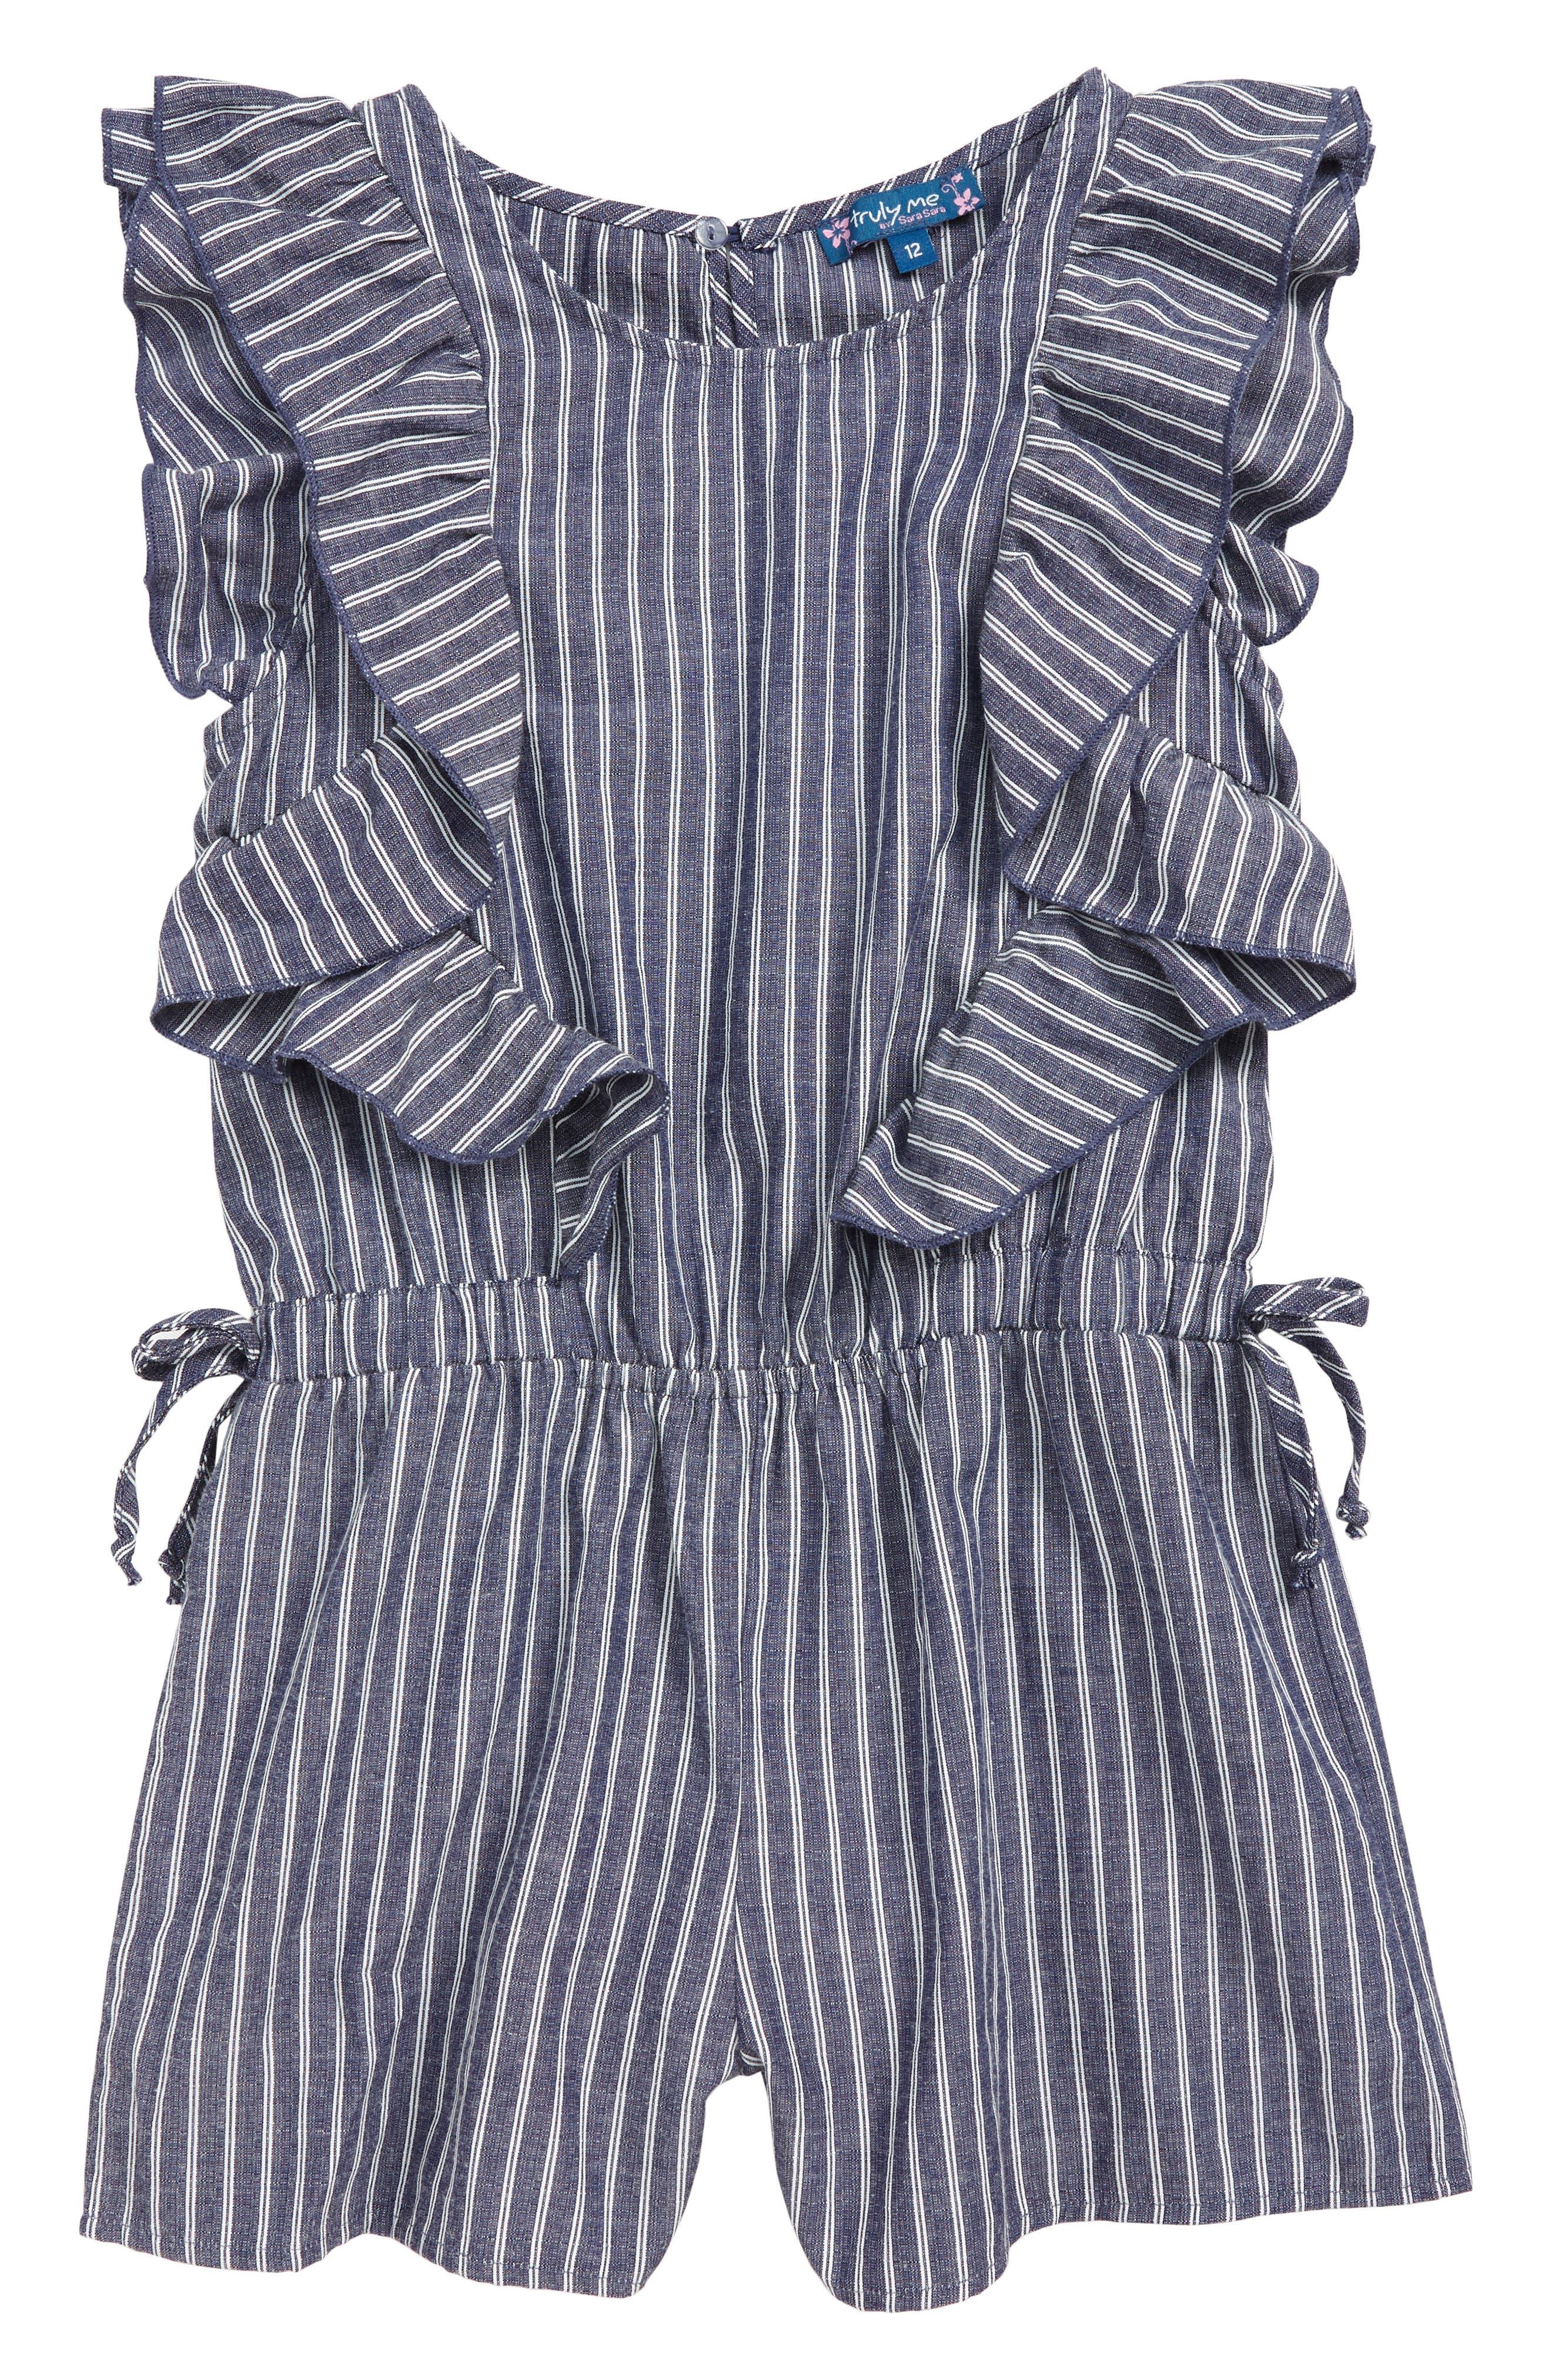 TRULY ME Stripe Ruffle Romper, Main, color, BLUE